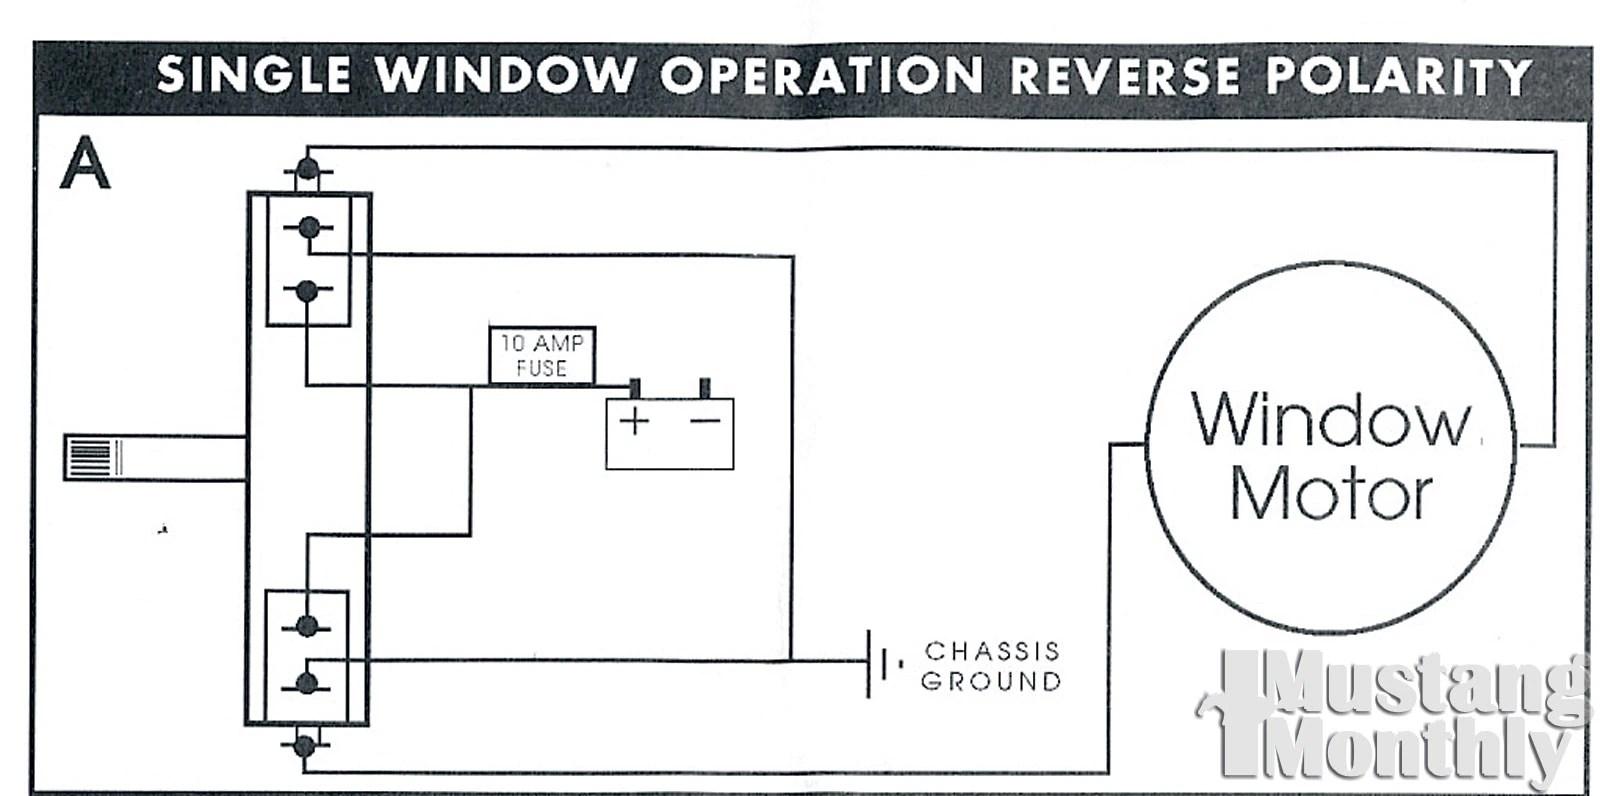 mump 1107 20 electric life power windows single window wiring power window wiring diagram chevy mump [ 1600 x 796 Pixel ]